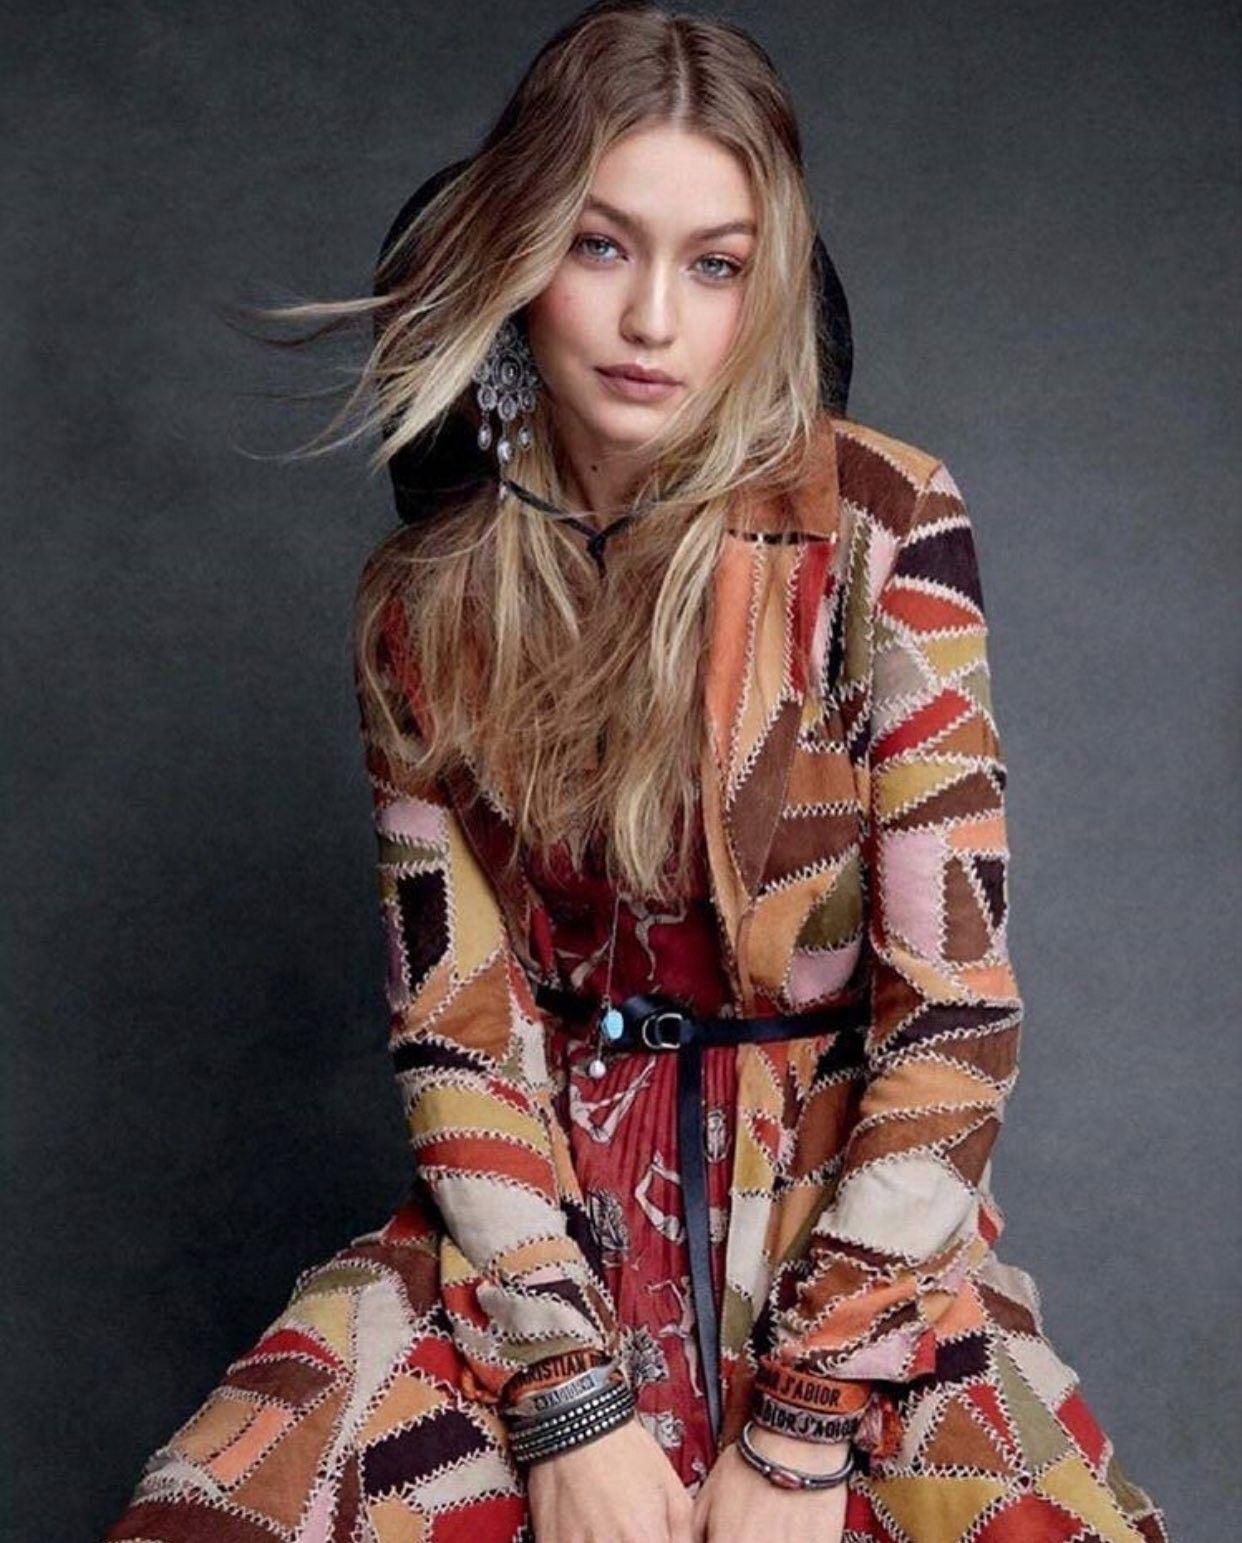 Patrick Demarchelier Vogue Ideias: Gigi Hadid For VOGUE US December 2017 Photographed By